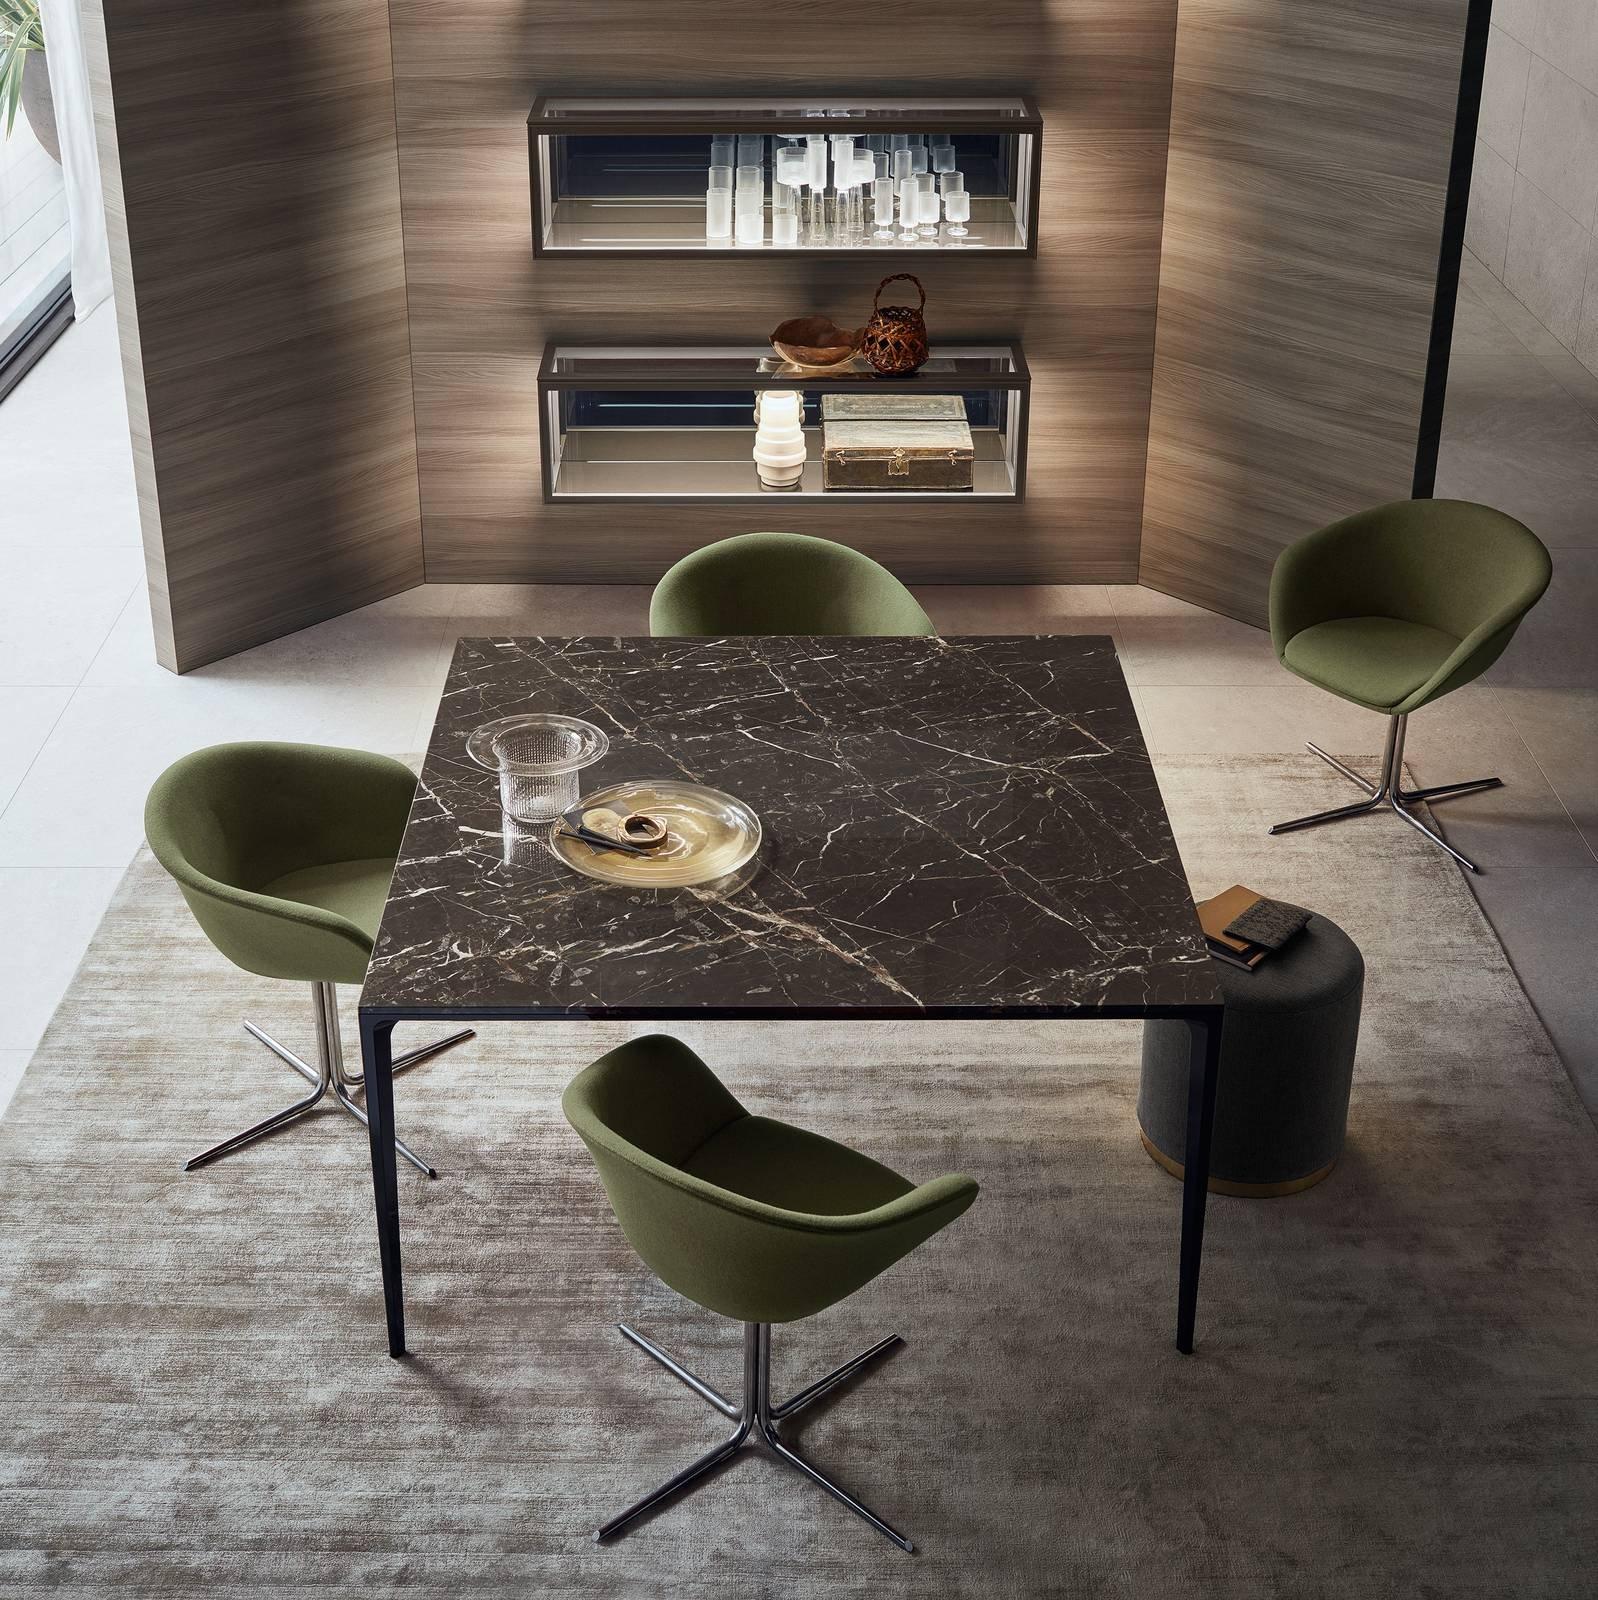 Rimadesio tavoli amazing tabula di rimadesio tavoli - Tavolo manta rimadesio ...